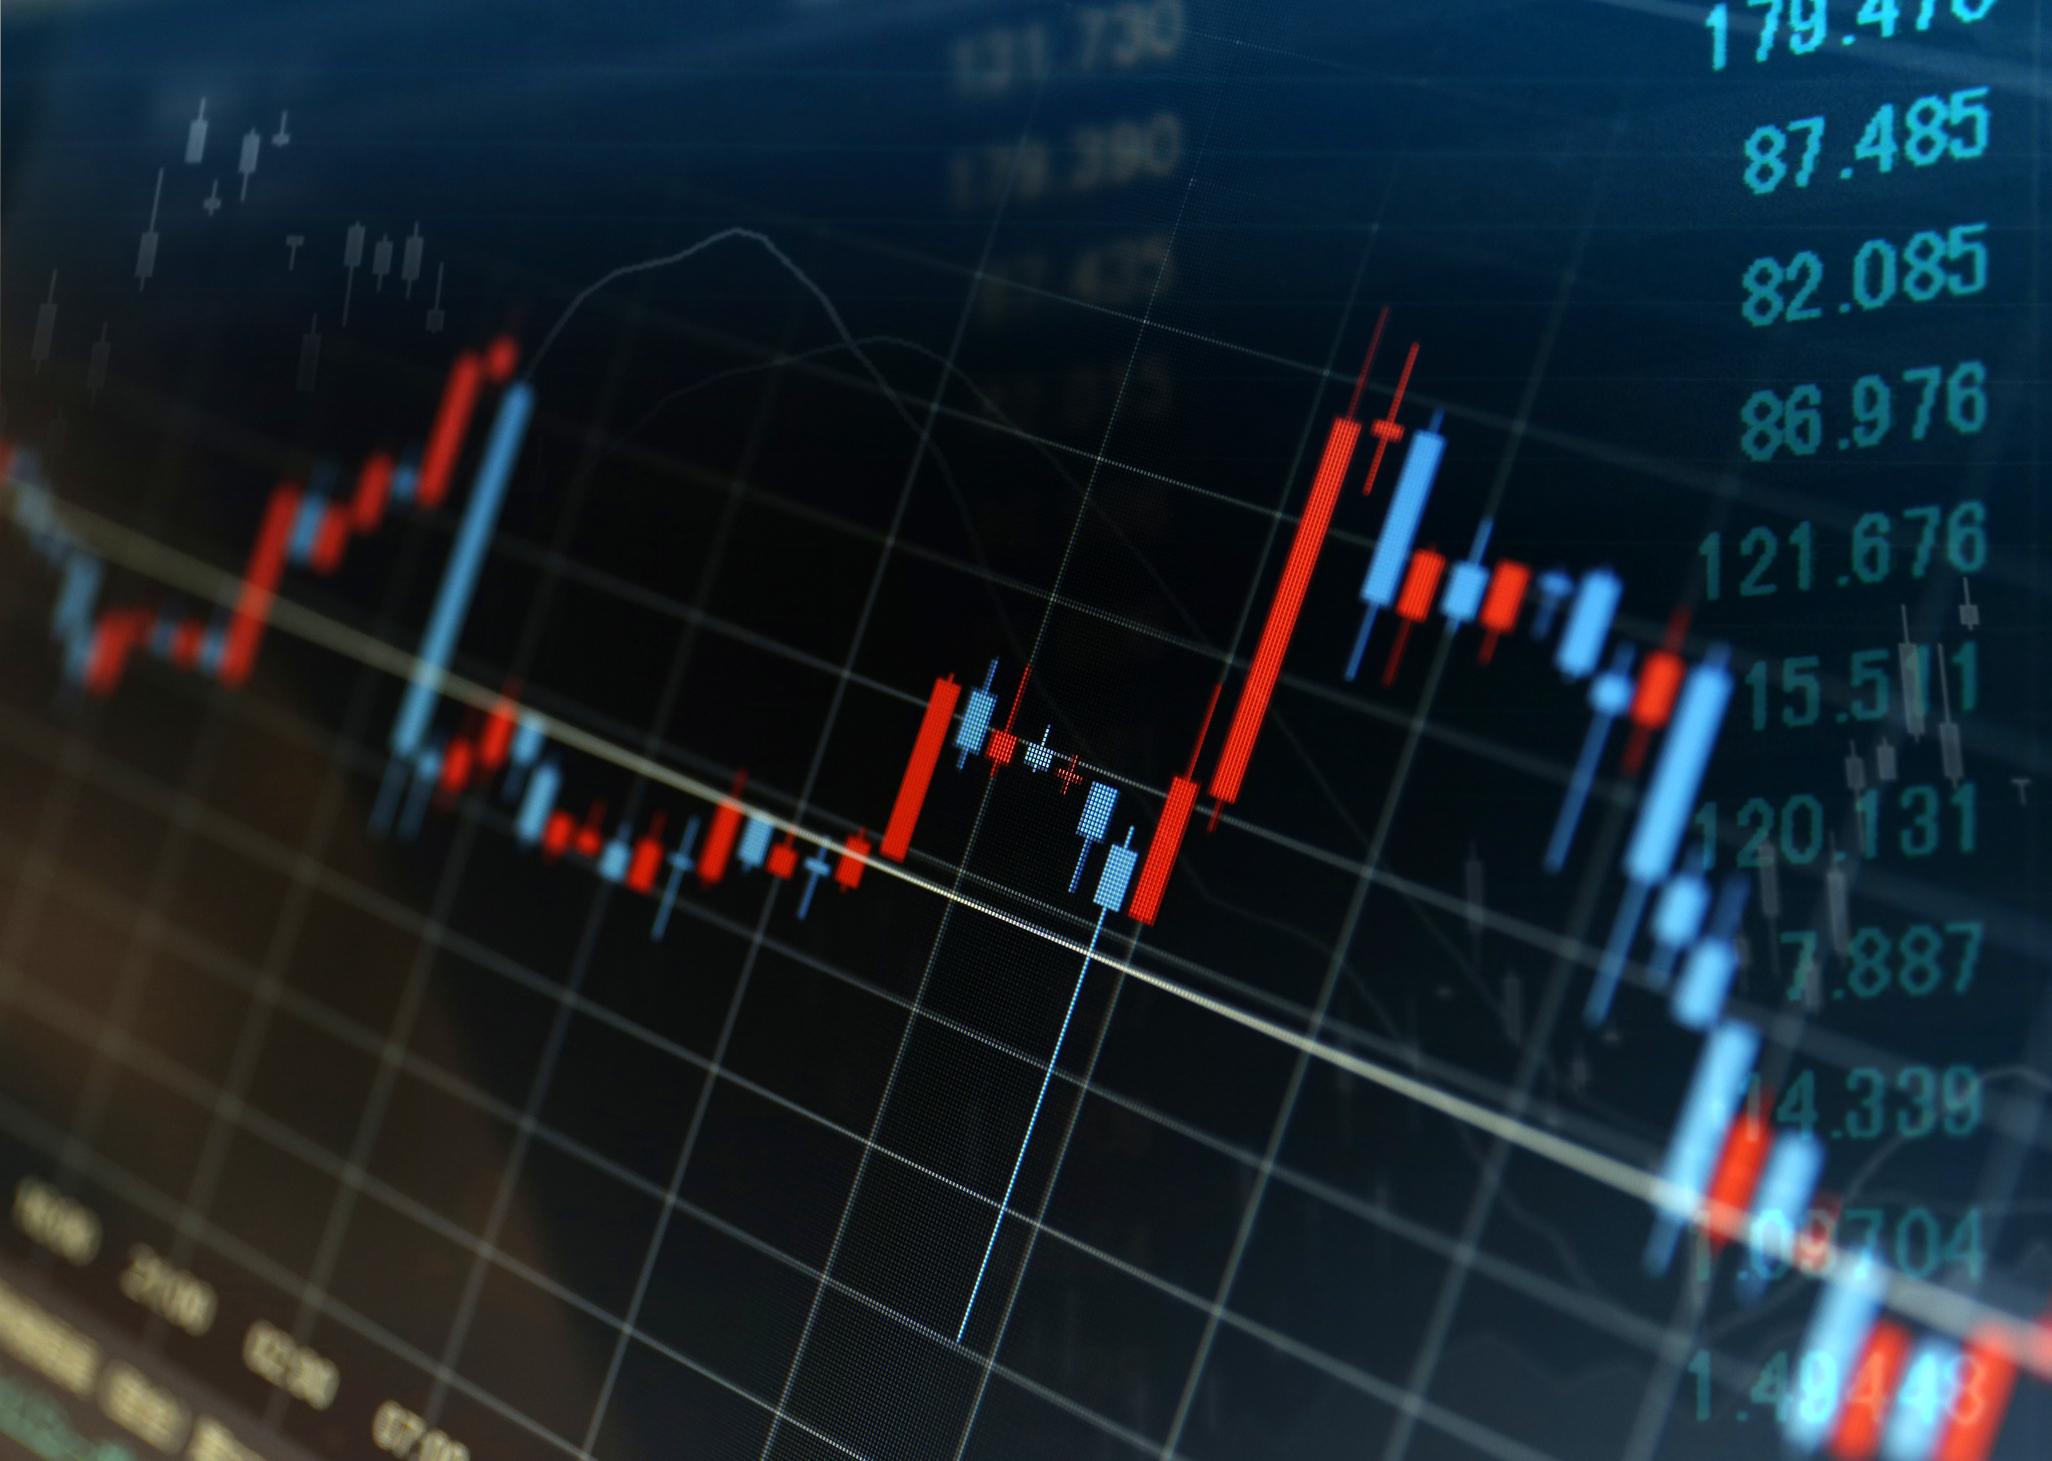 Stock bar graph.